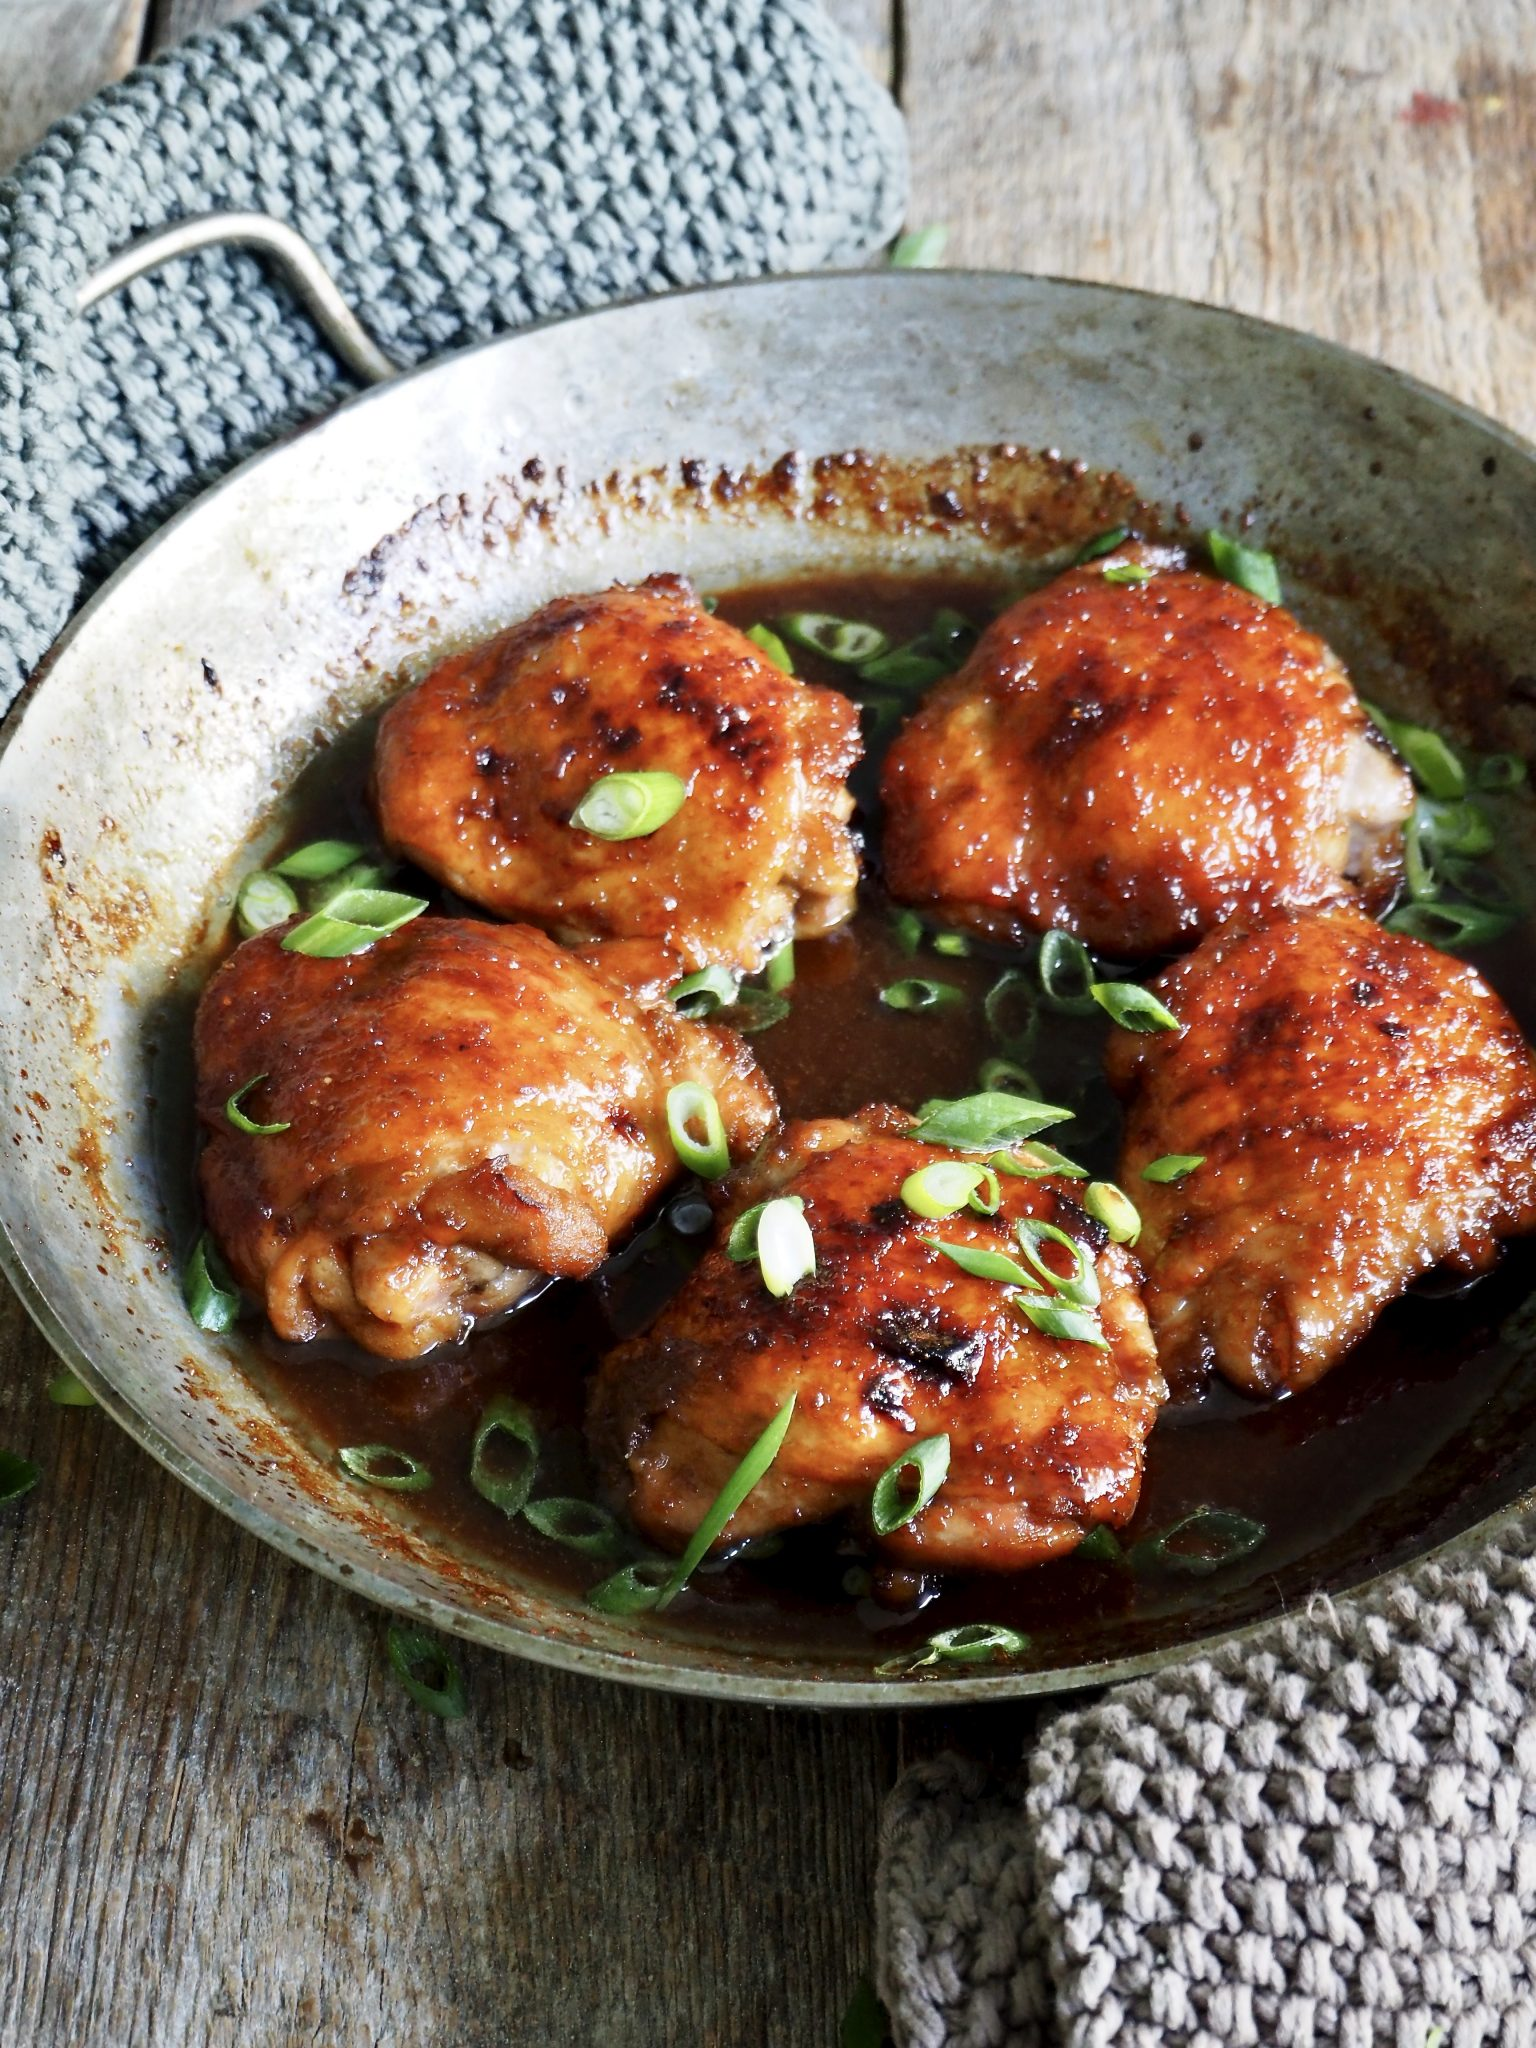 Ovnsbakt kylling med soyasaus og honning